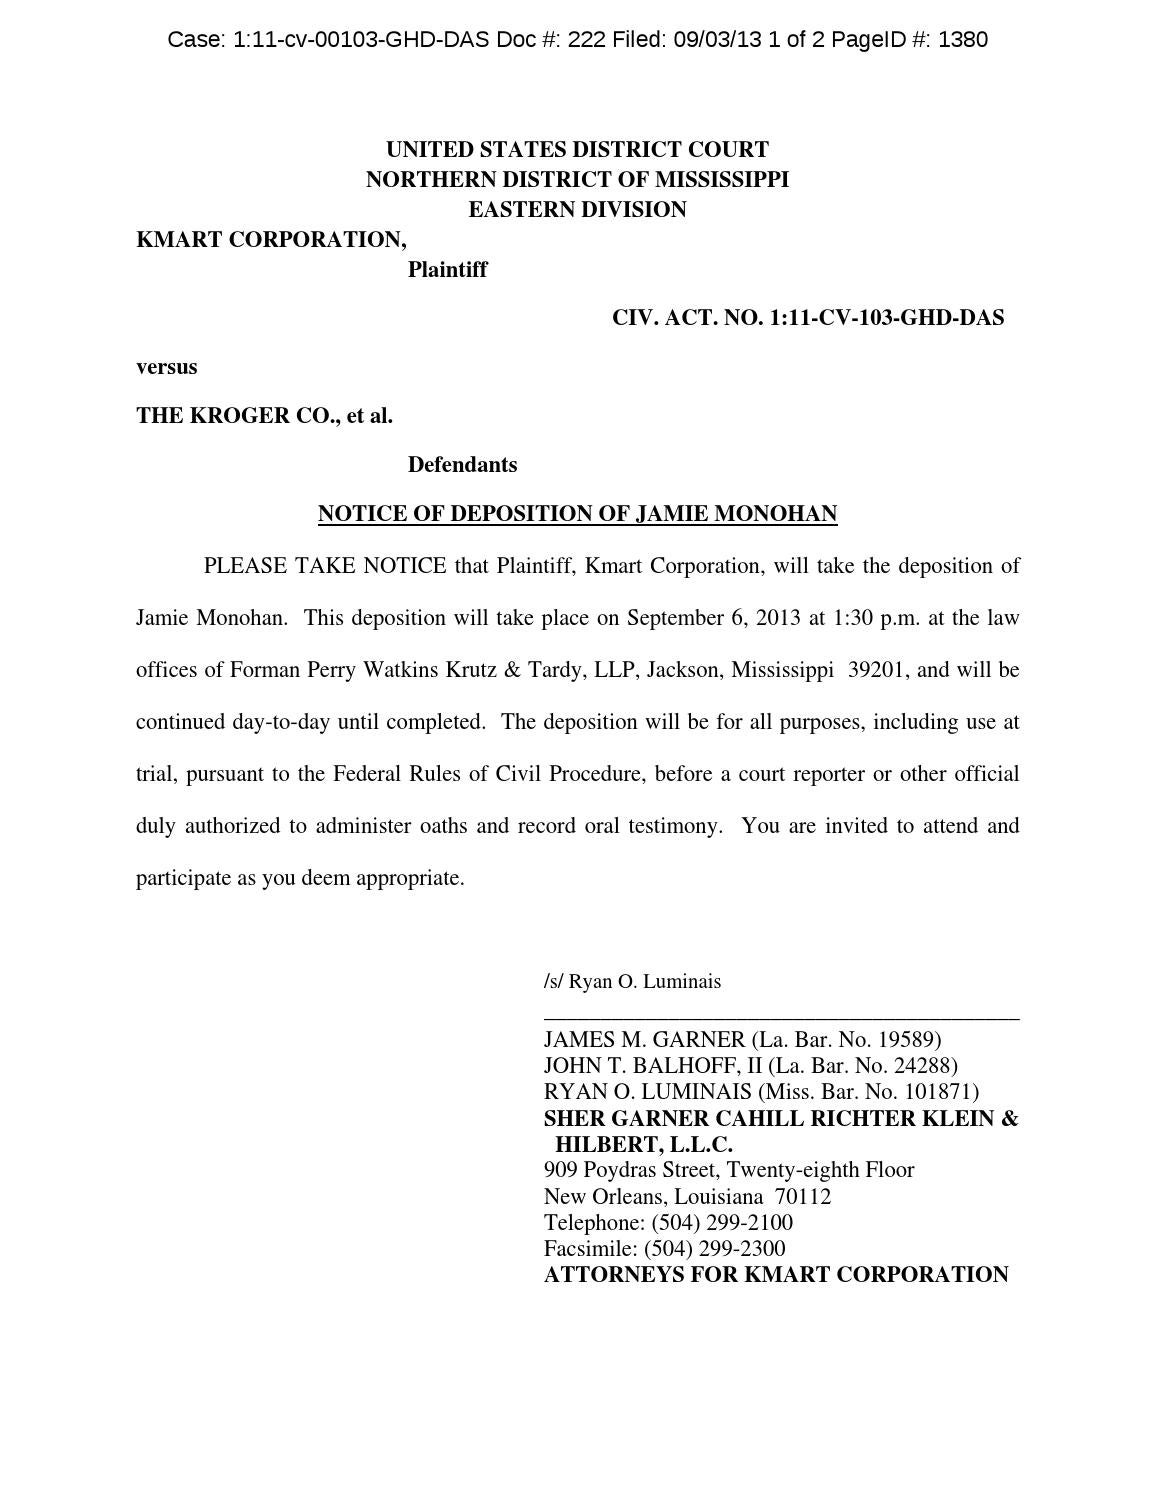 Mississippi Rules Of Civil Procedure >> Mississippi Rules Of Civil Procedure Auto Car Reviews 2019 2020